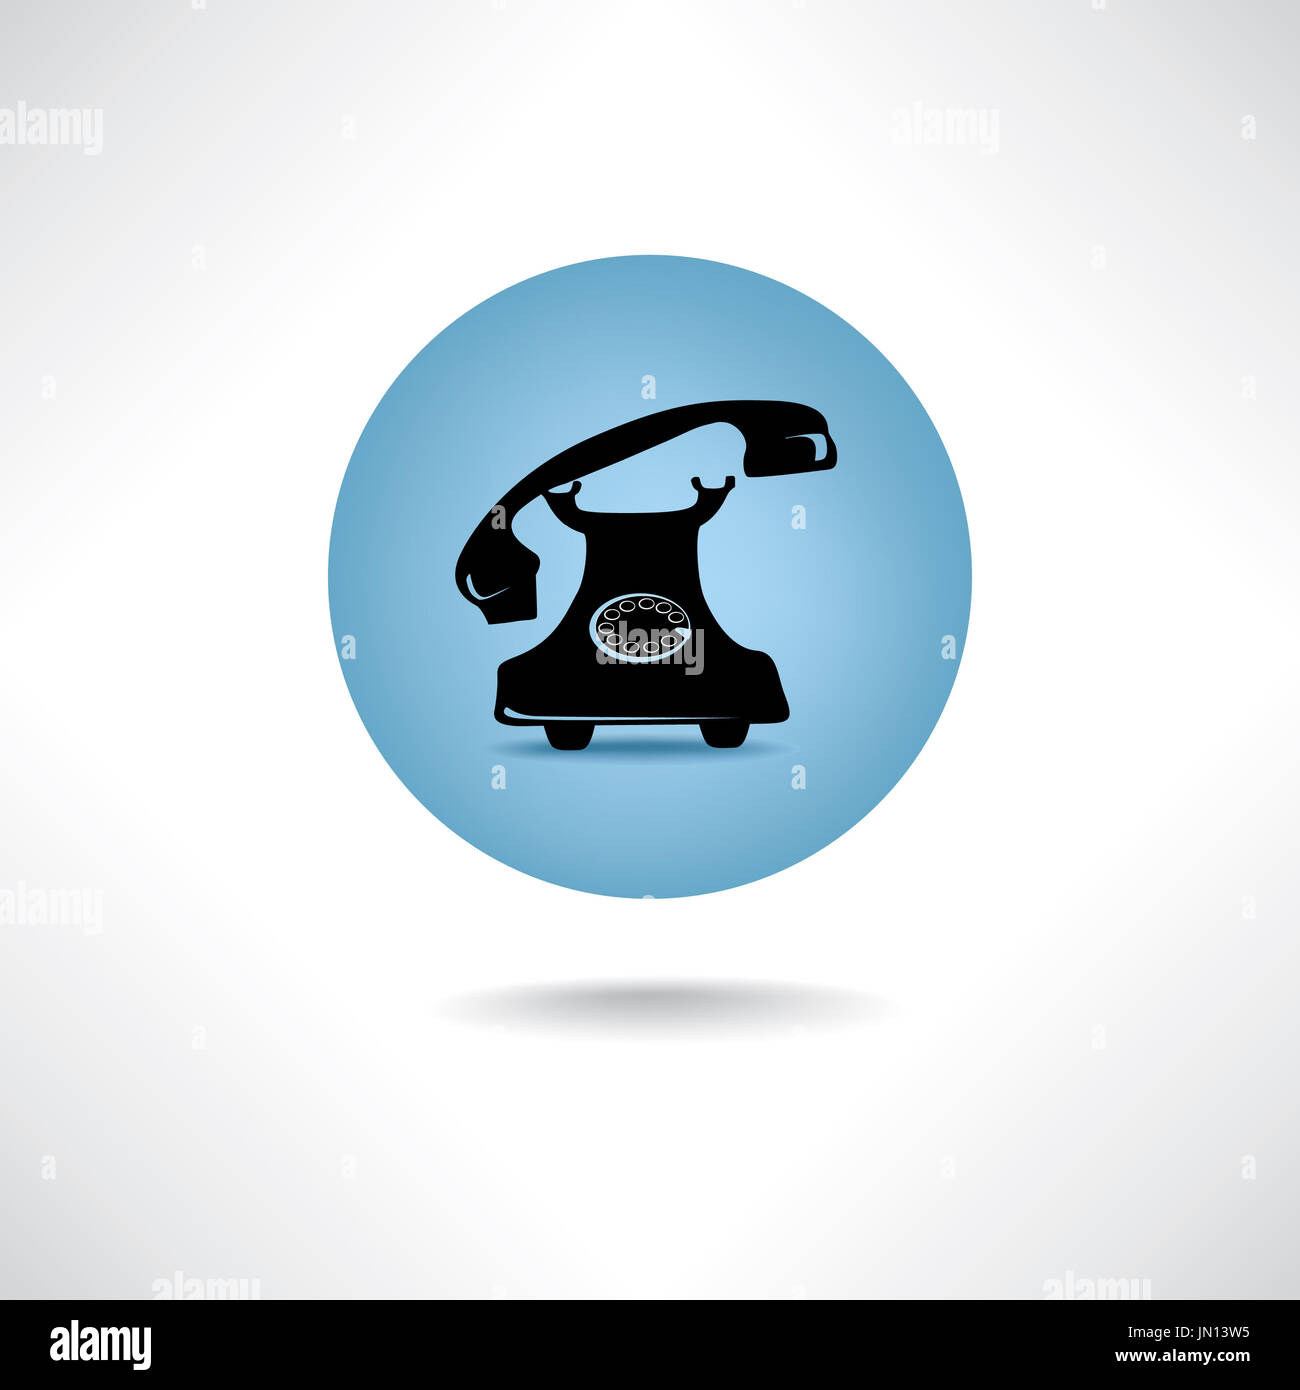 Old phone icon. Retro communiation symbol. Handset sign - Stock Image